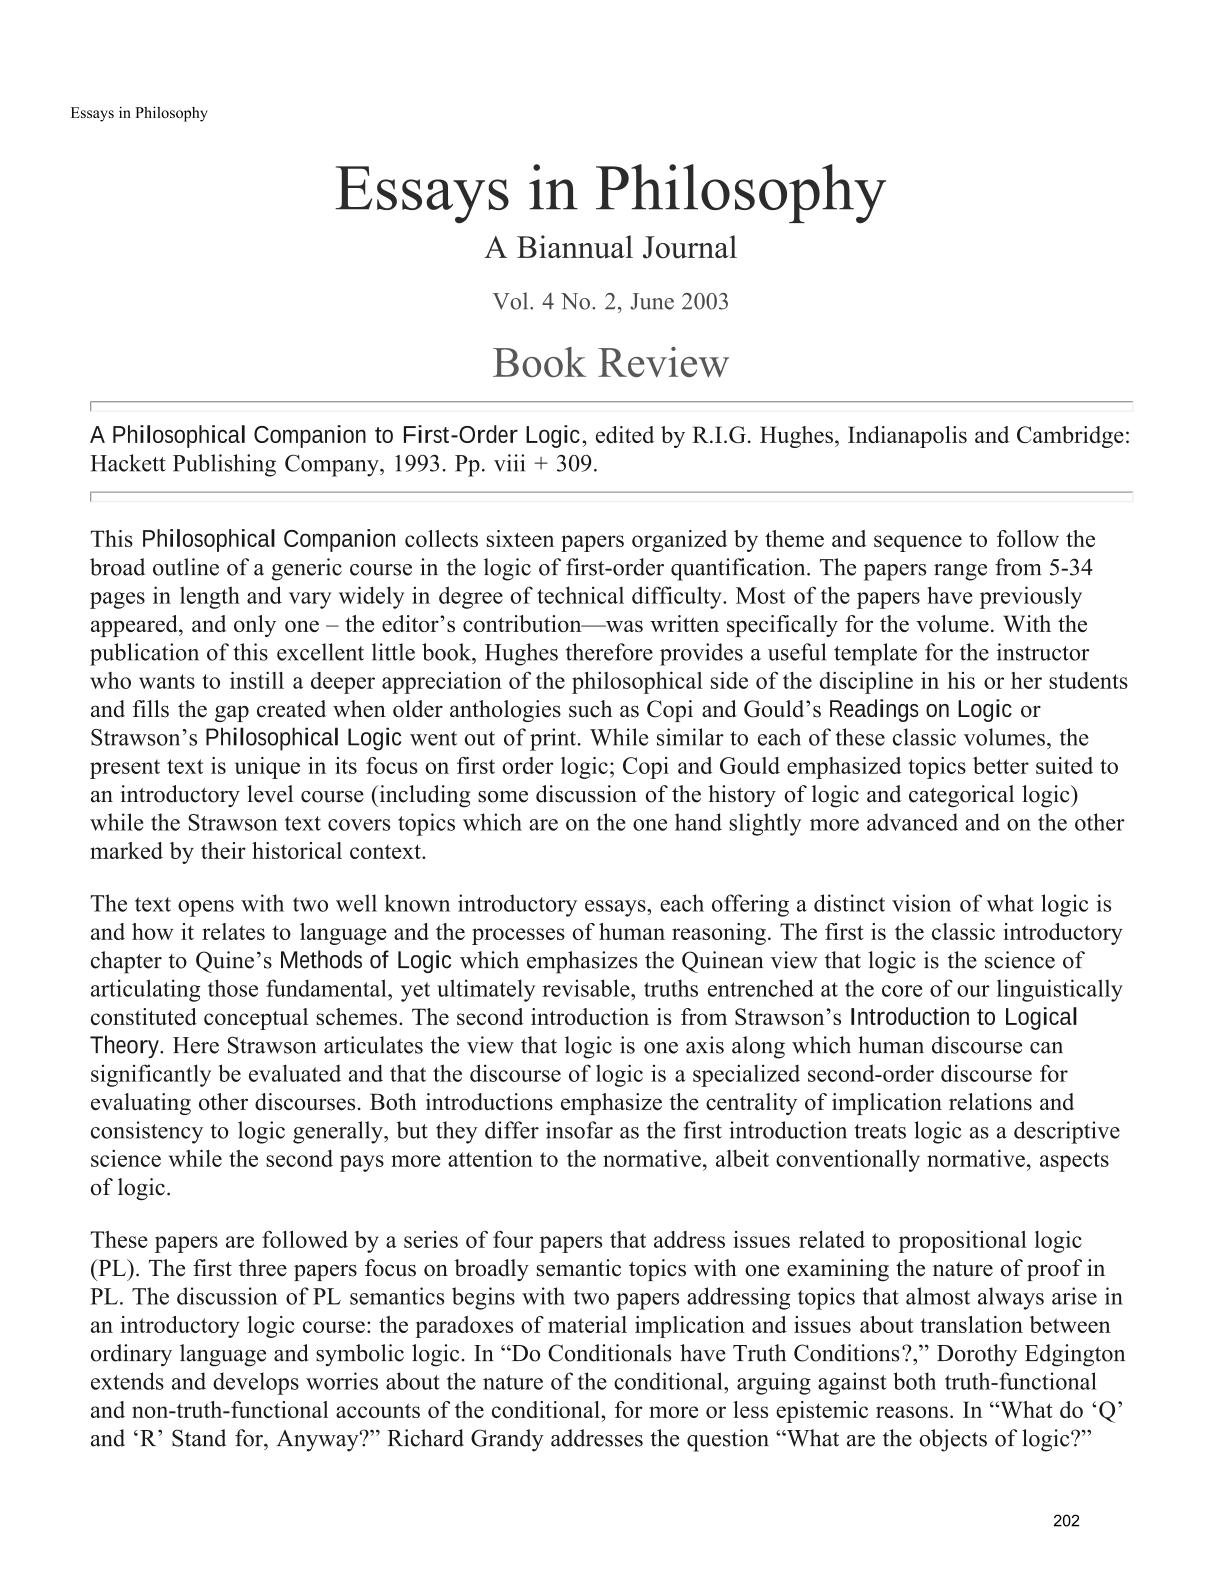 Order logic essays write my remedial math curriculum vitae